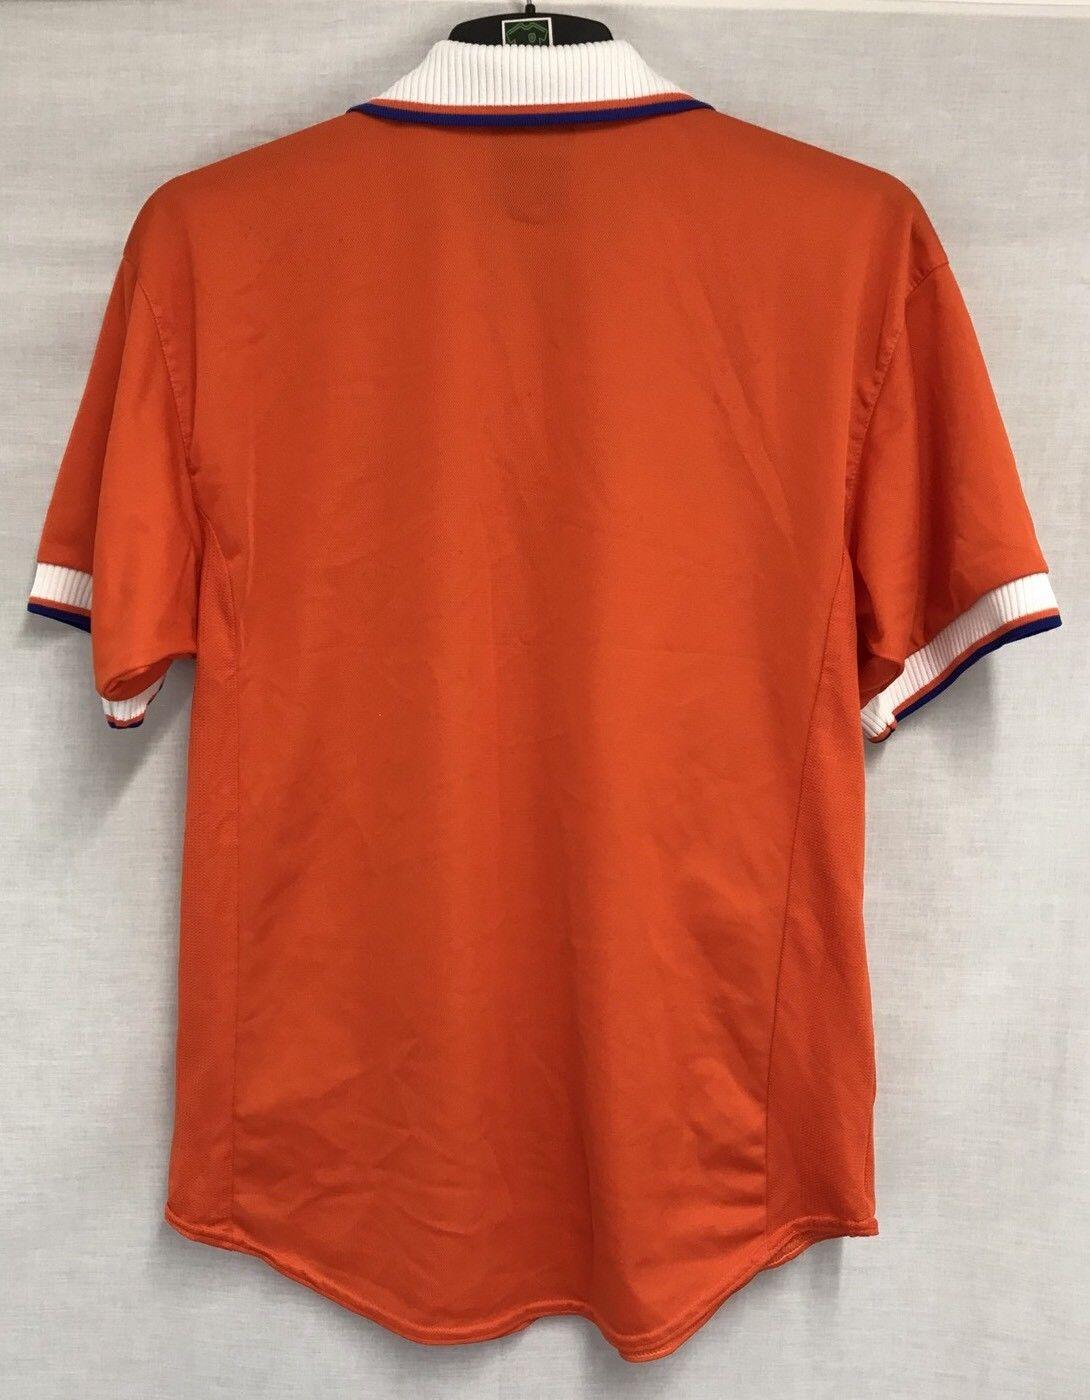 c72b6e3ff Holland Football Shirt 1997 98 Adults Large Nike – Historic Football ...